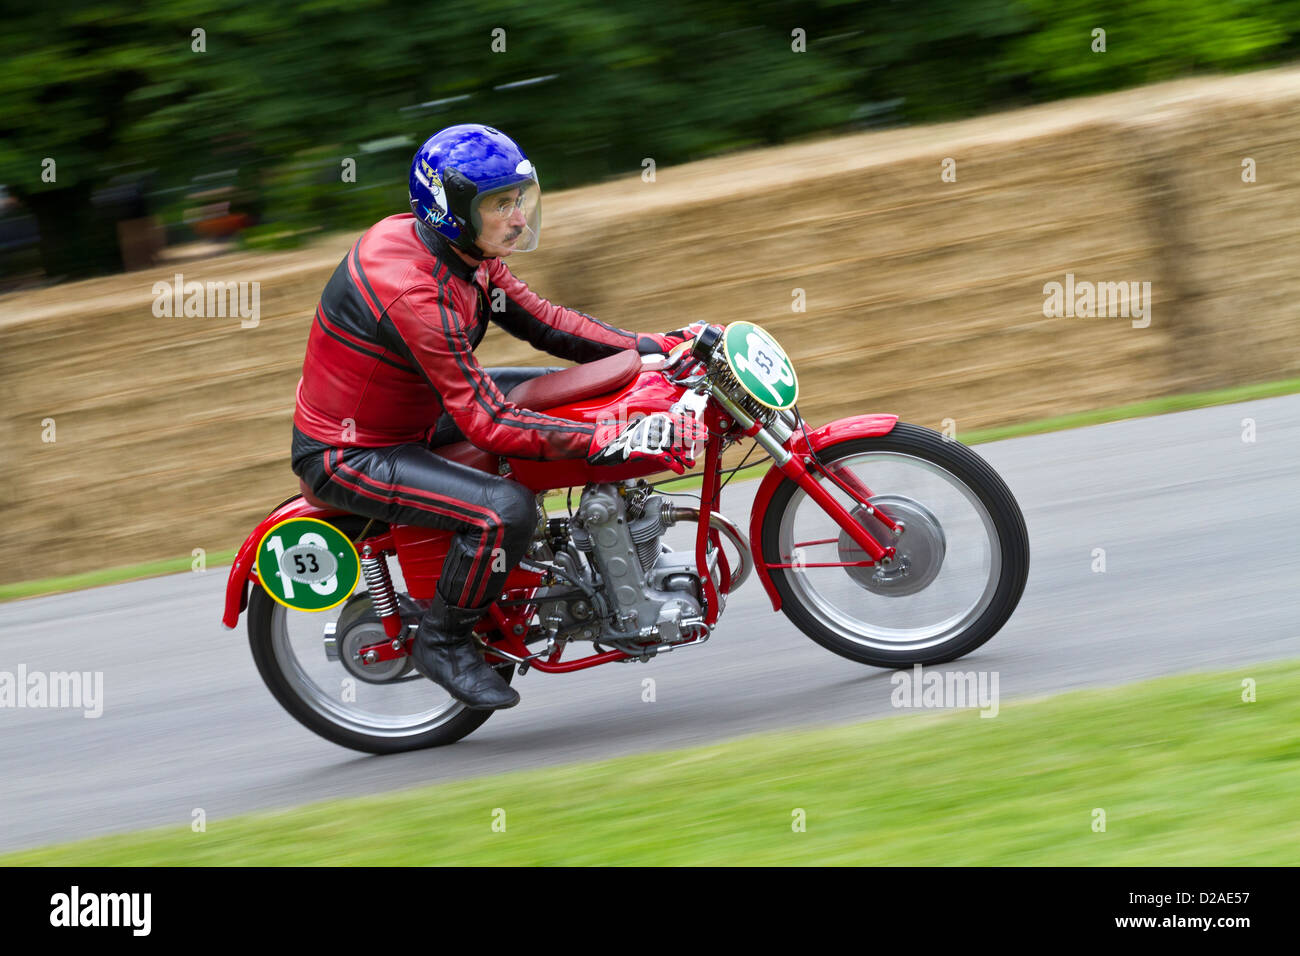 1953 MV Agusta Monoalbero mit Fahrer Paul Galles auf die 2012 Goodwood Festival of Speed, Sussex, UK. Stockbild